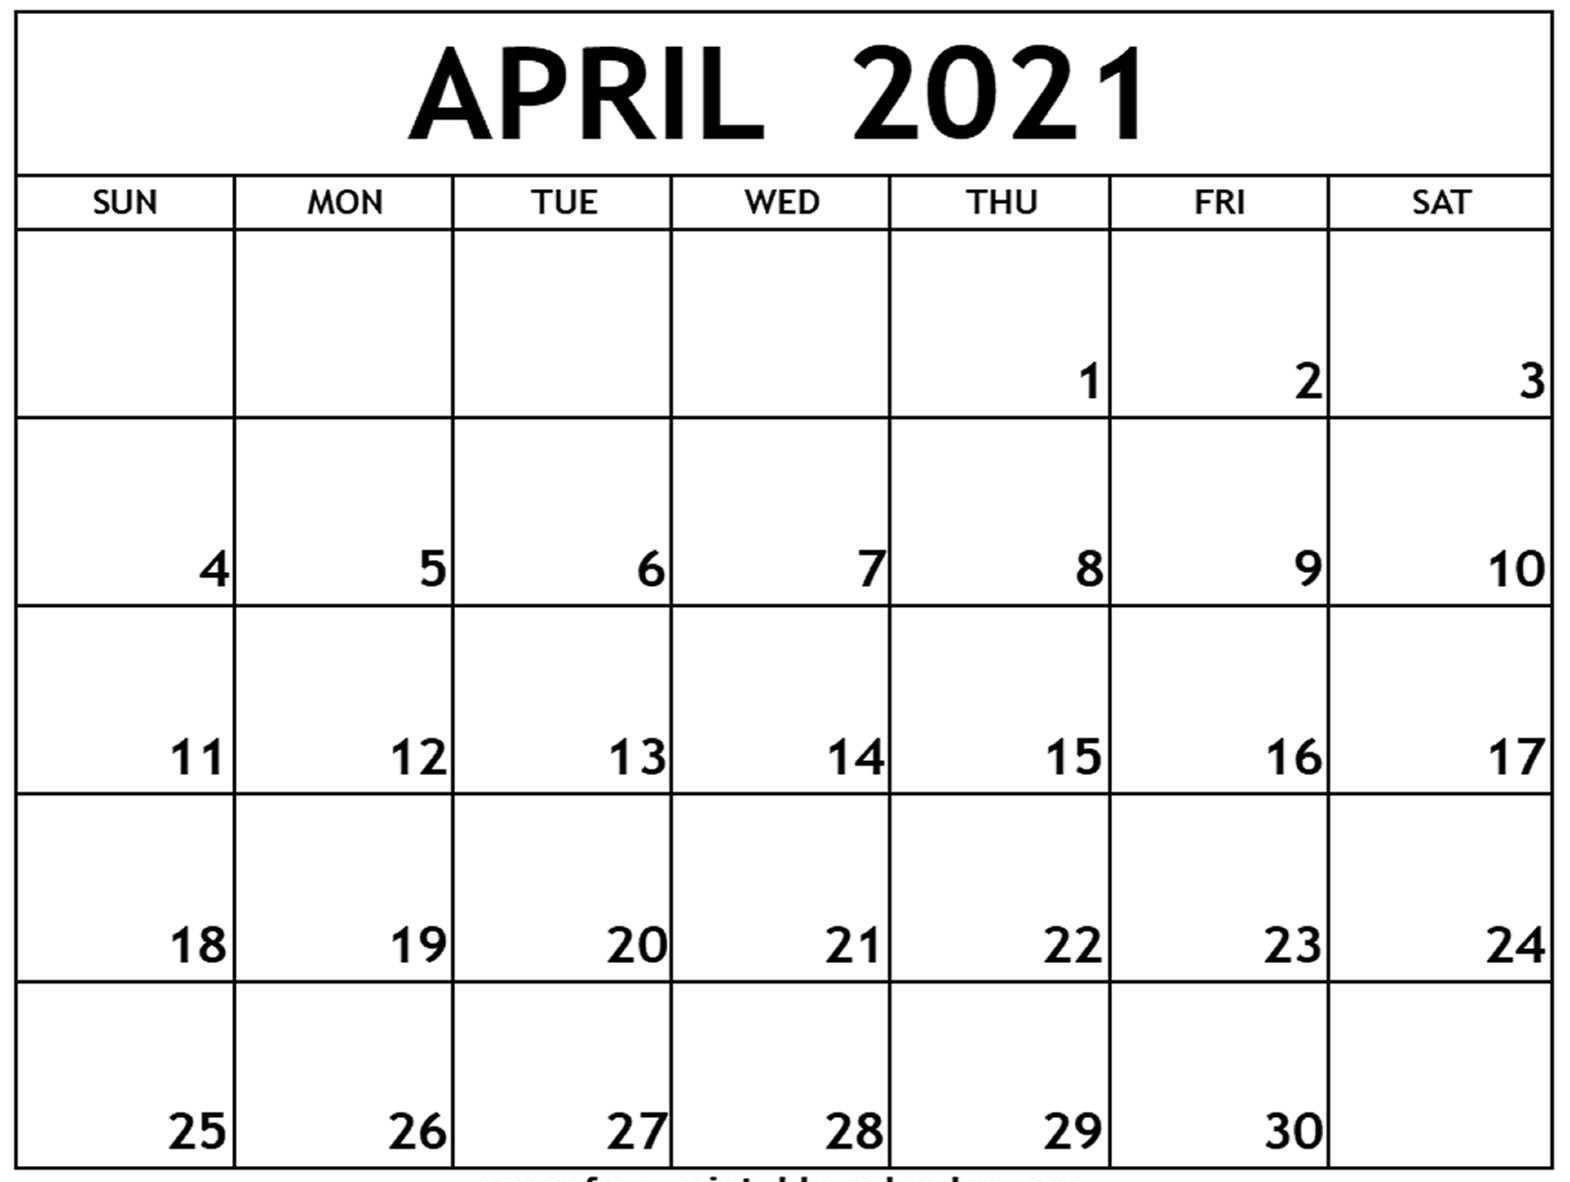 April 2021 Calendar Editable